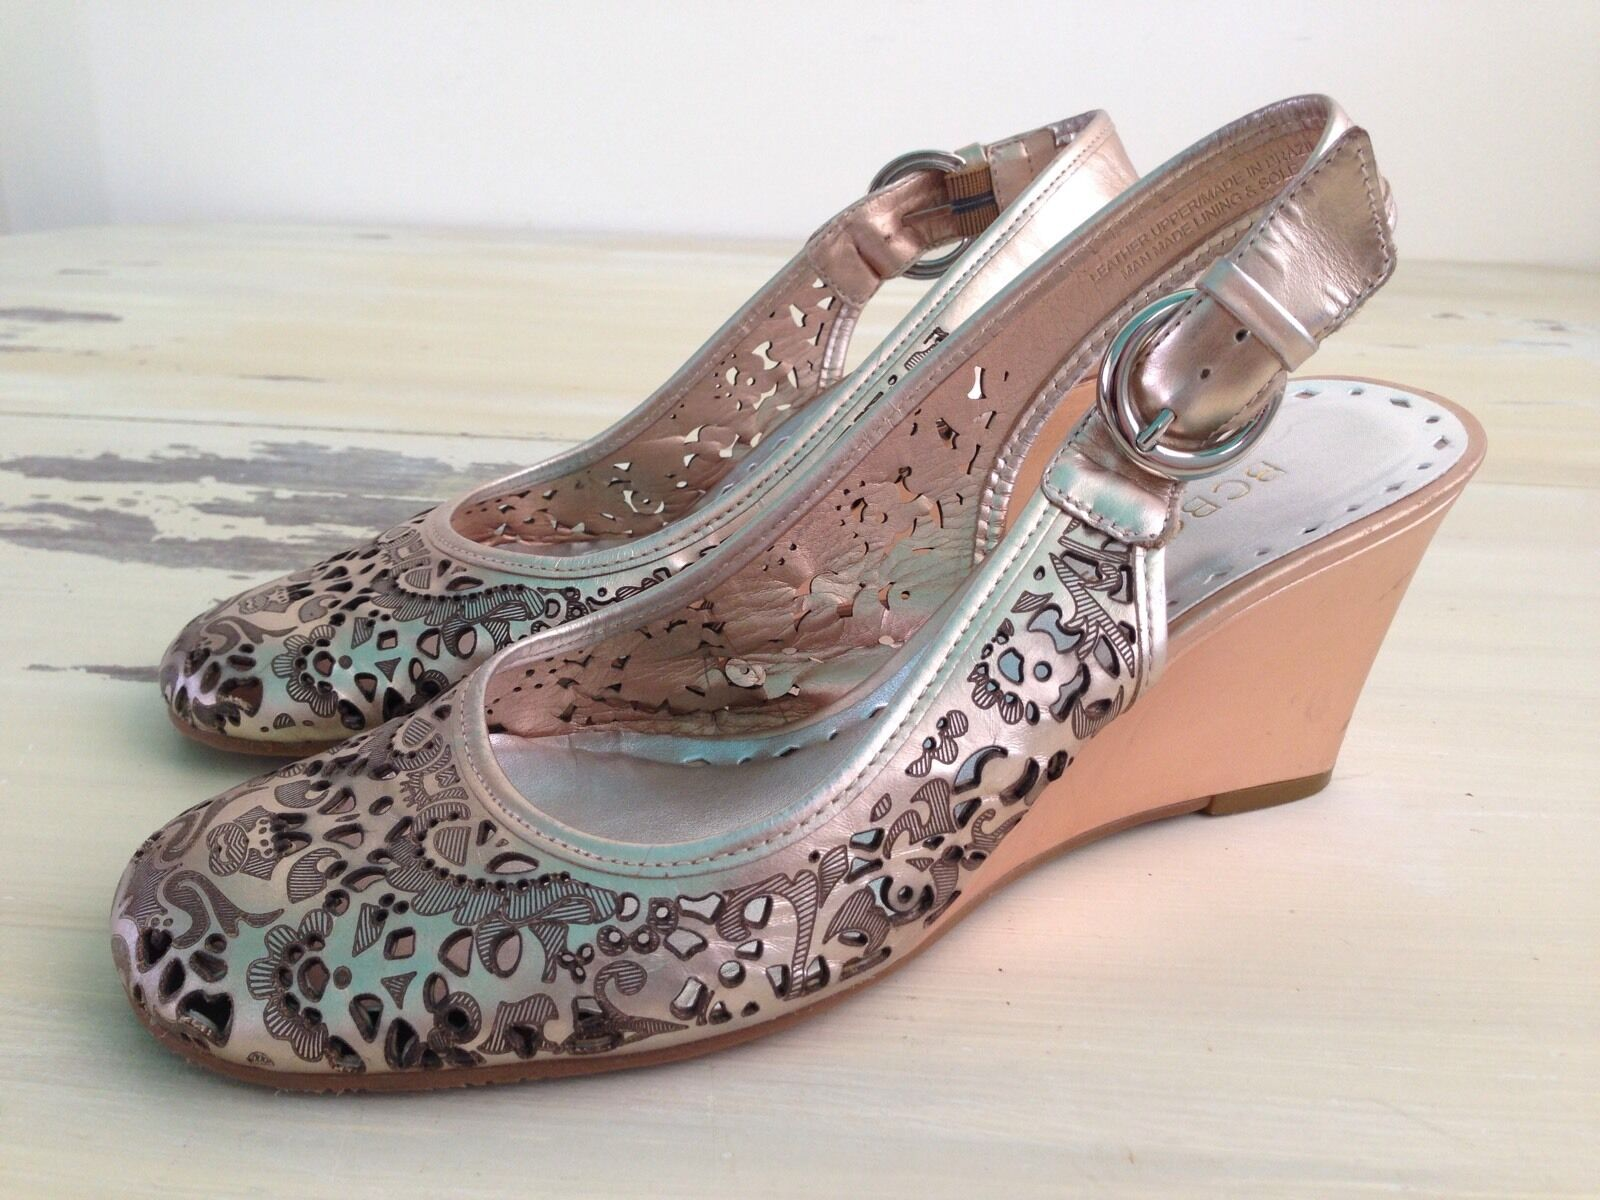 BCBGirls - Wedge Womens Copper Metallic Leather Wedge - Strapped Heel Sandals, 7B 7 B f4ea93